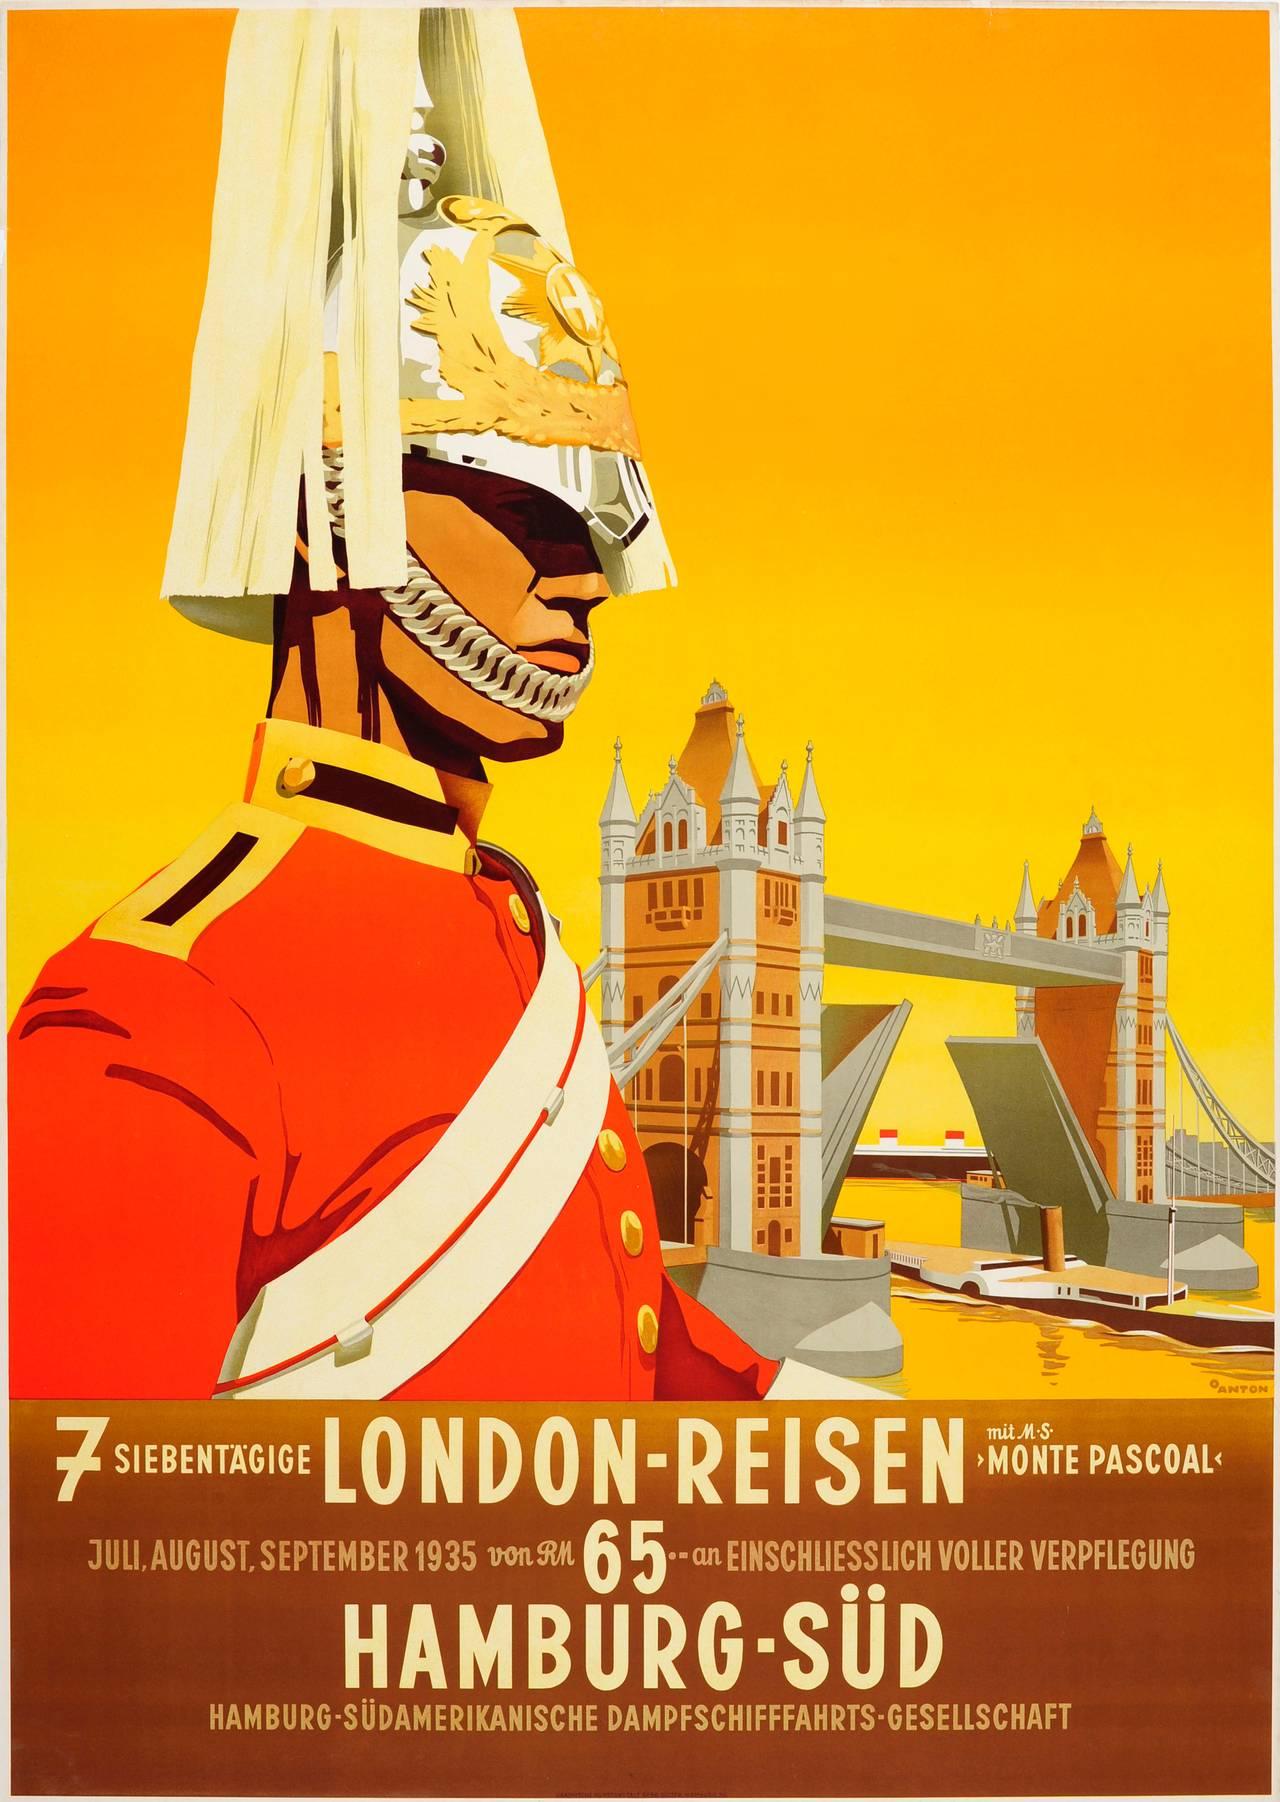 Rare Original 1935 Travel Poster Advertising London By Hamburg Sud Shipping Line